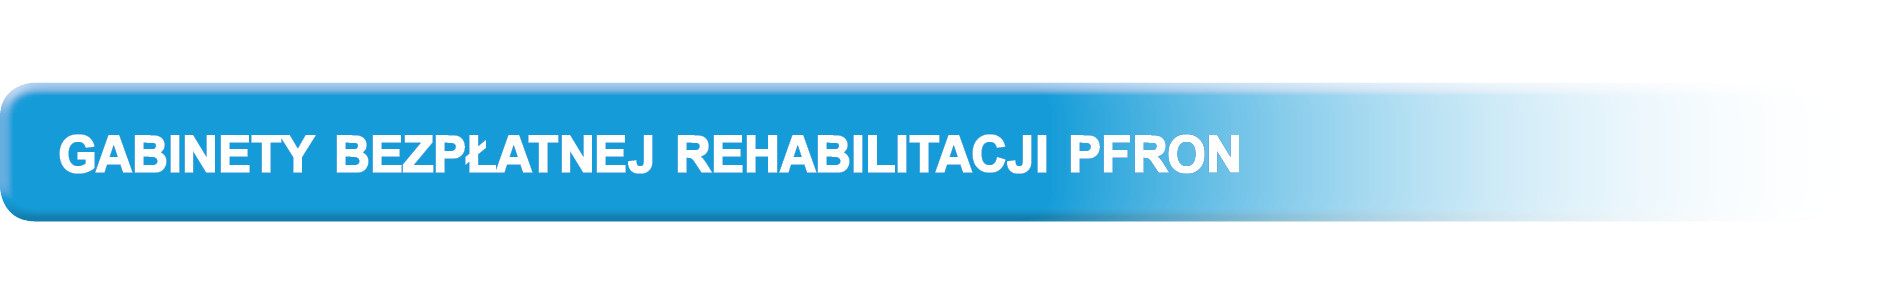 BIOMICUS_gabinety bezpł reh PFRON